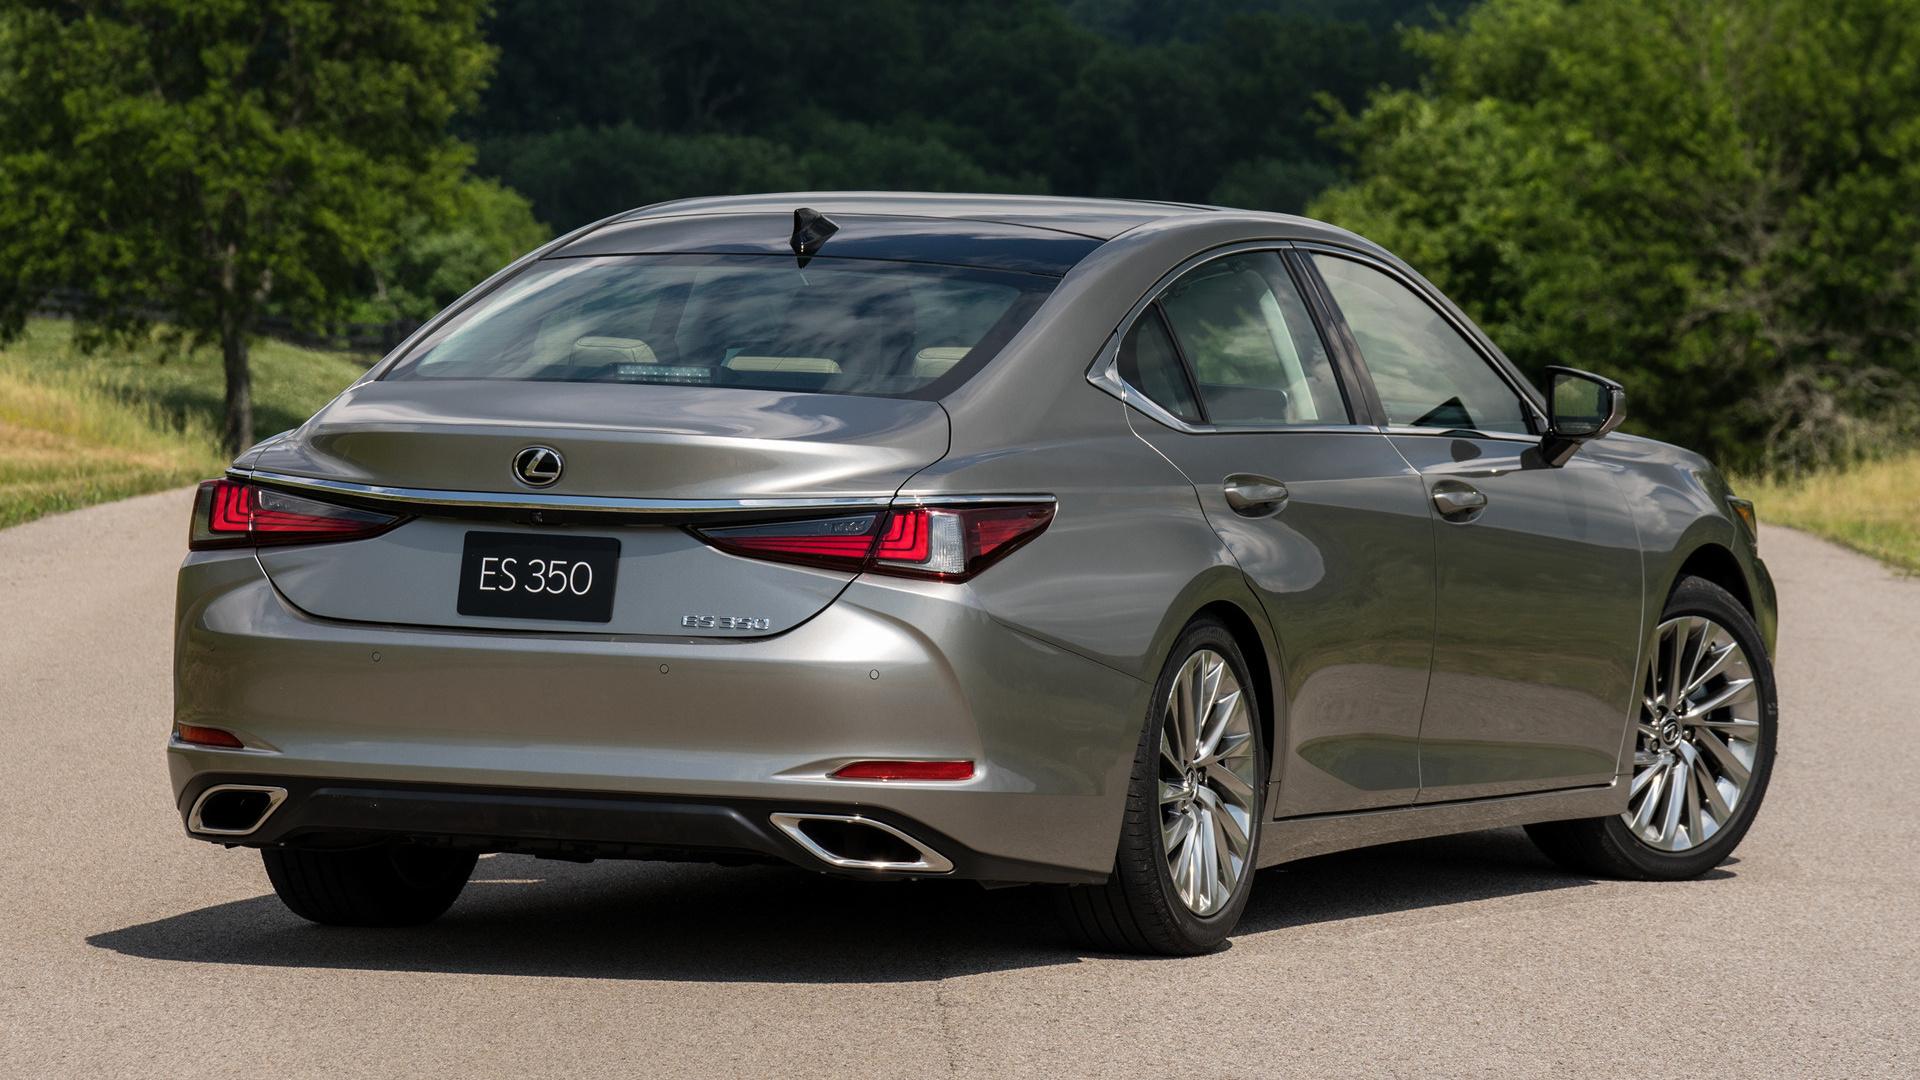 Lexus ES (2019) Wallpapers and HD Images - Car Pixel